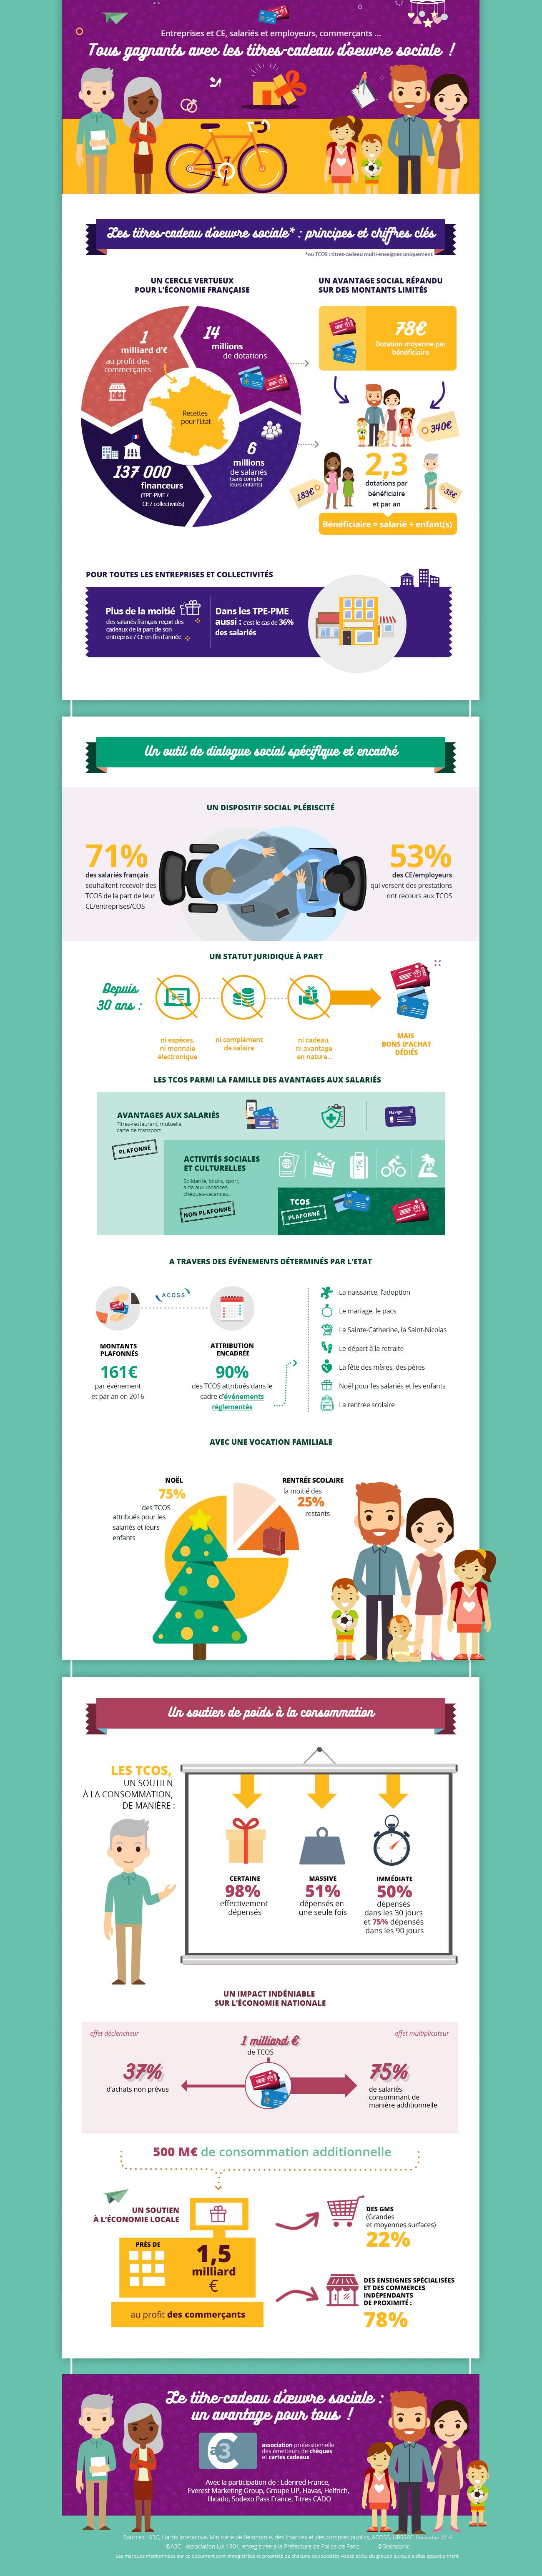 infographie-A3C